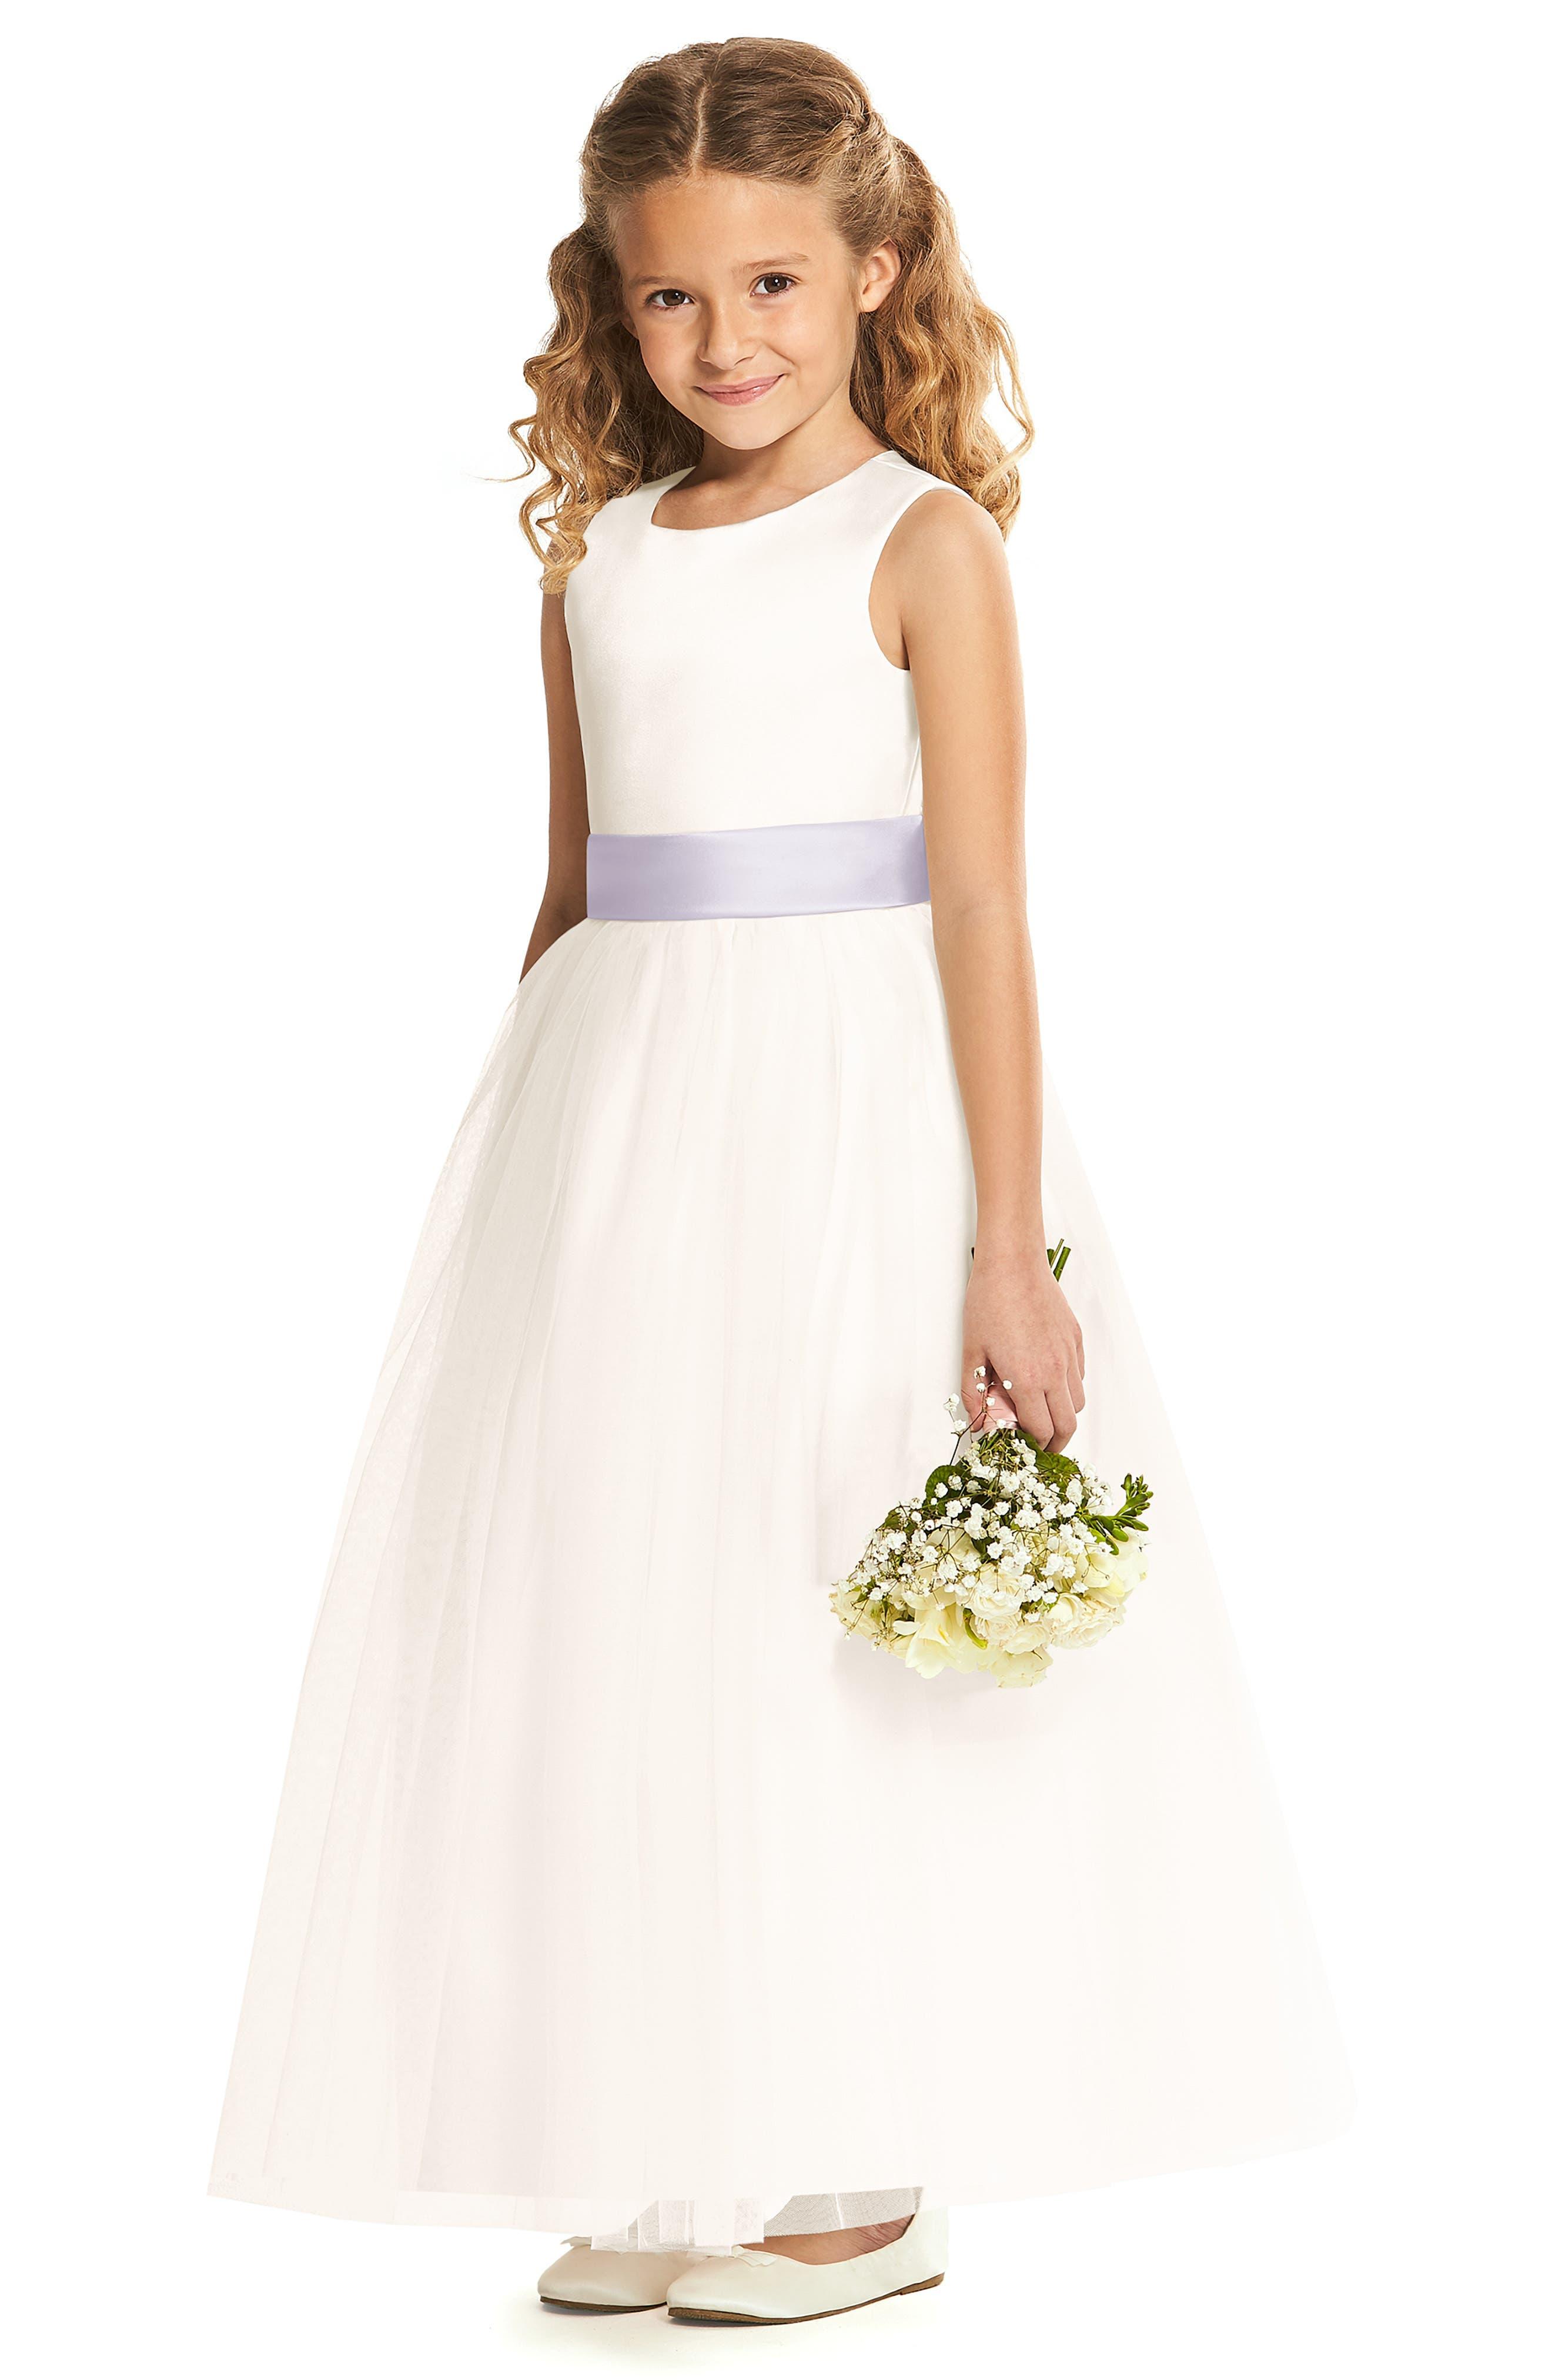 Tulle flower girl dress Pageant dress-Princess dress-Beige flower dress Flower girl dress Champagne Dress Tulle dress-InfantToddler